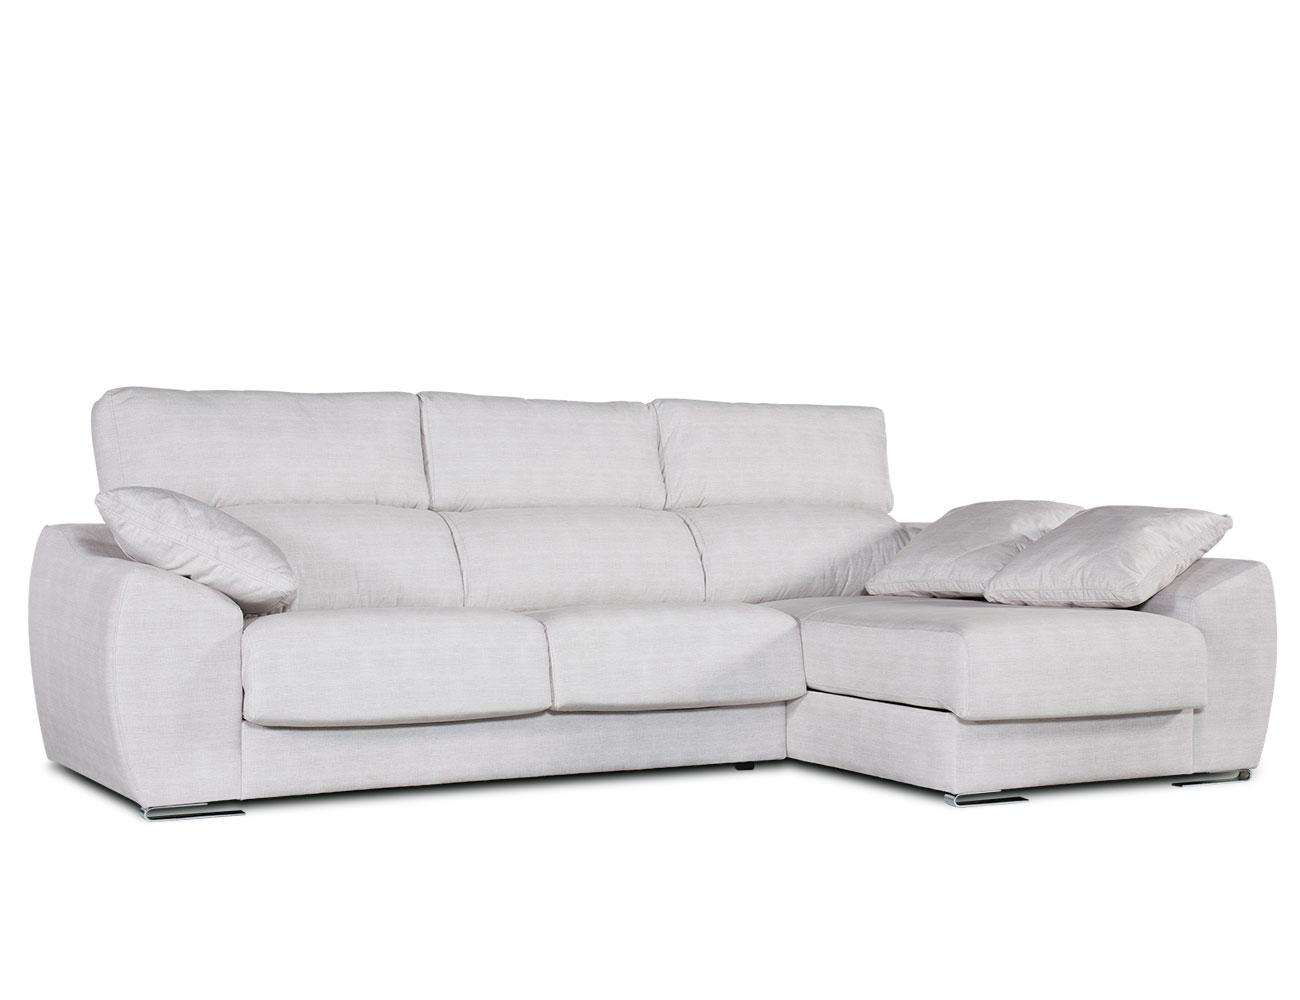 Sofa chaiselongue moderno blanco 12